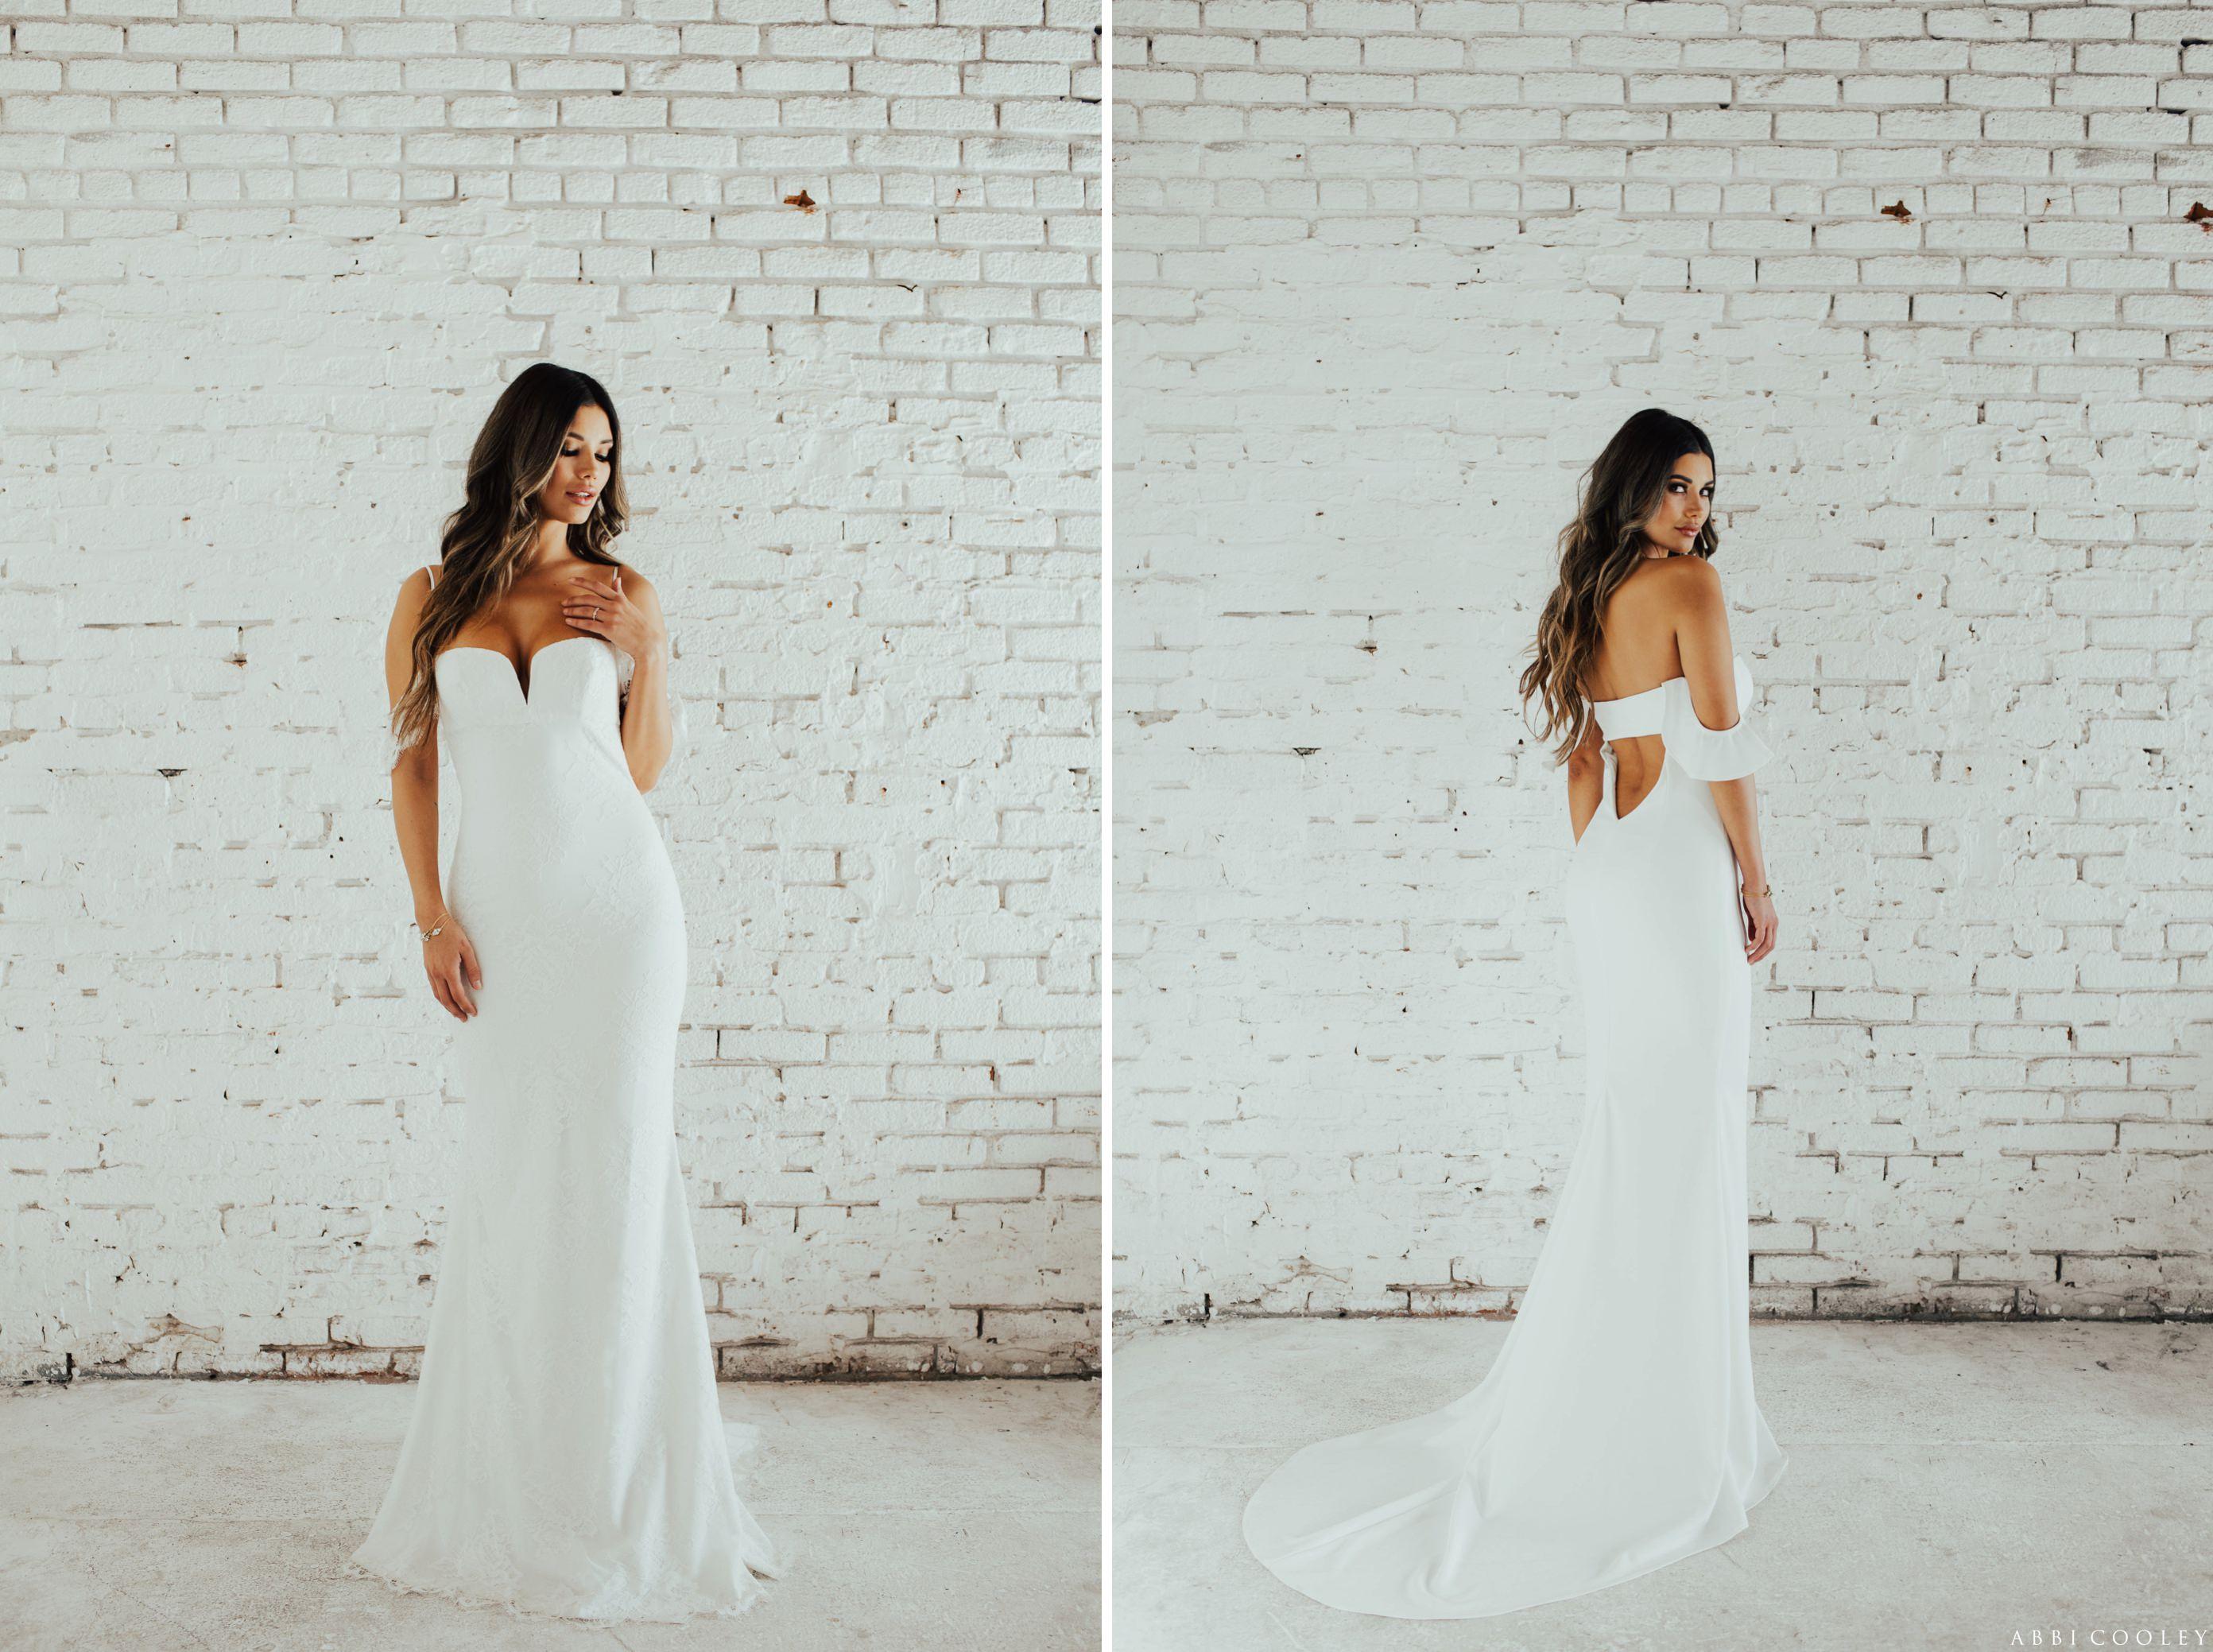 strapless wedding gown Katie May 2017 Lookbook